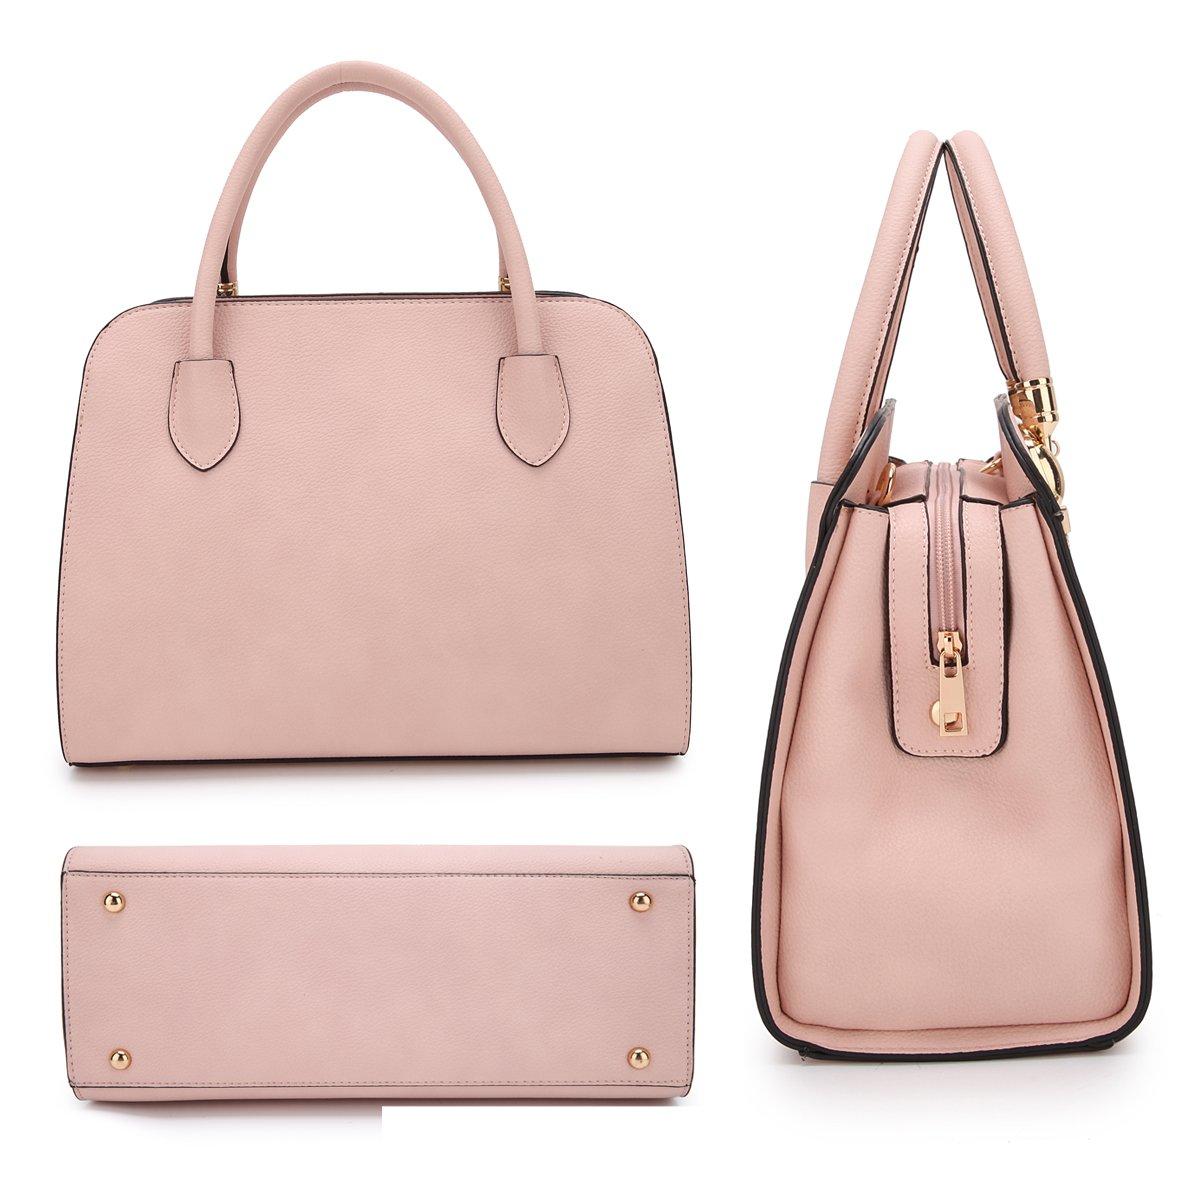 Women Structured Satchel Bags Vegan Leather Handbag Top Handle Purse Fashion Shoulder Bag with Fringed Tassel by Dasein (Image #3)